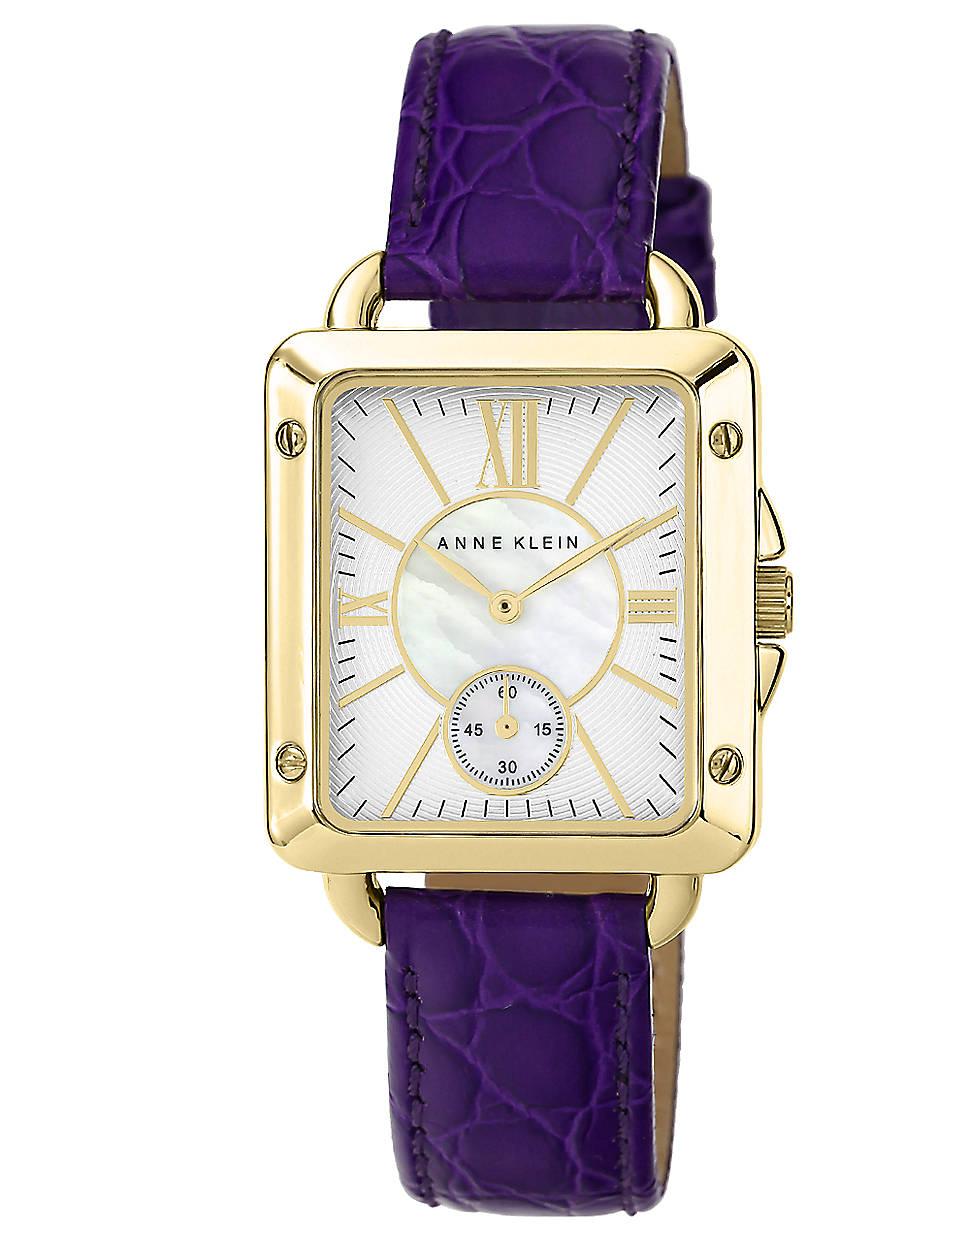 Anne klein watch with genuine leather strap in purple lyst for Anne klein leather strap